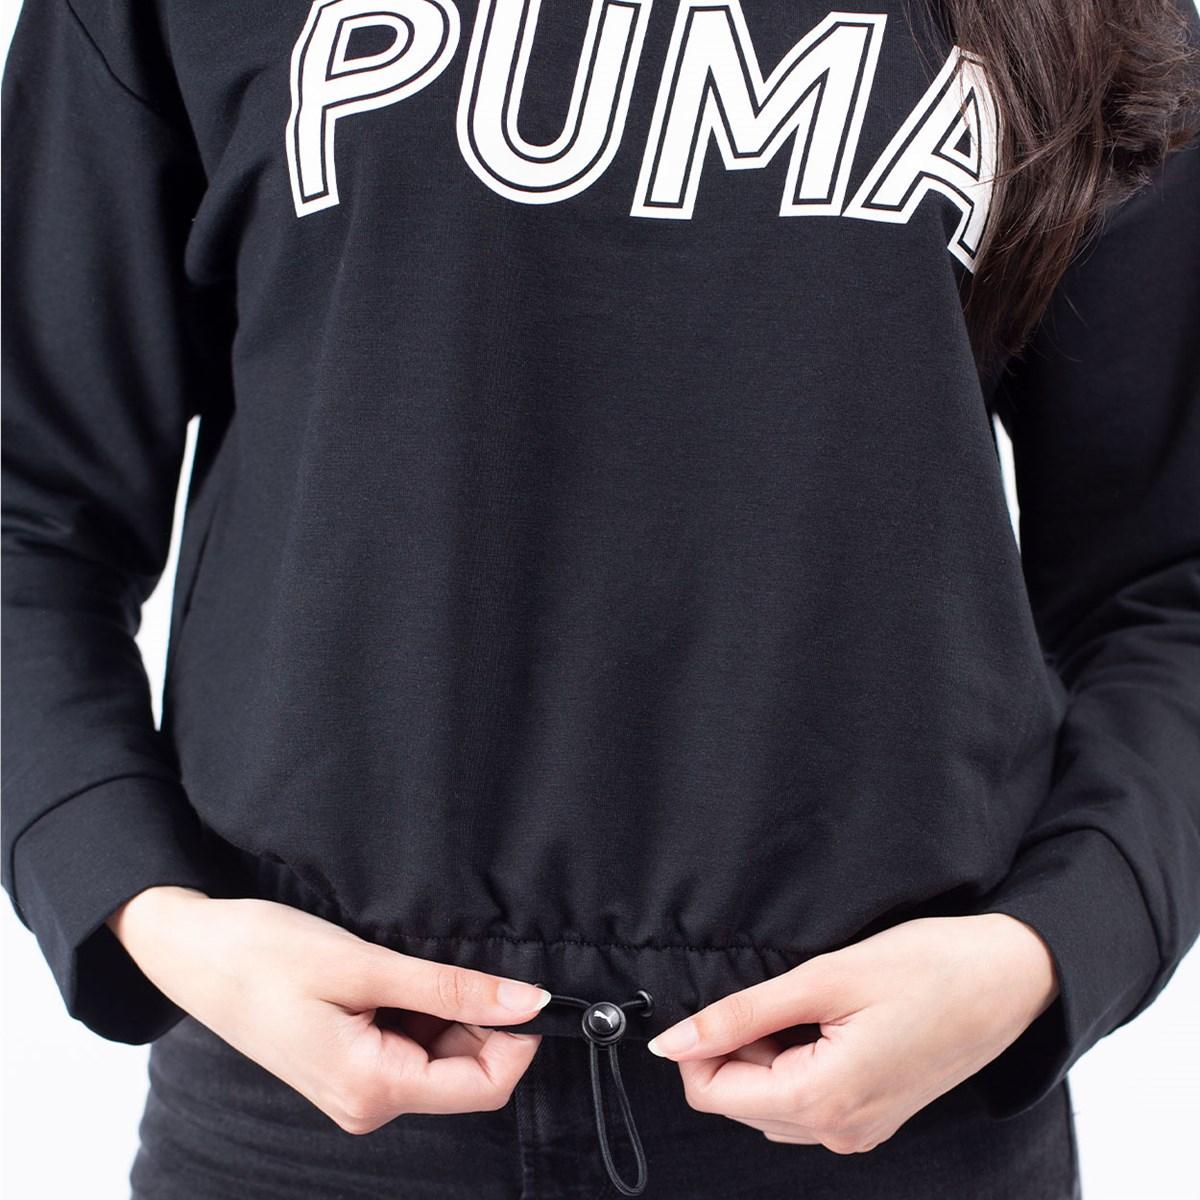 Moletom Puma Capuz Feminino Modern Sports Hoody Black 58123401